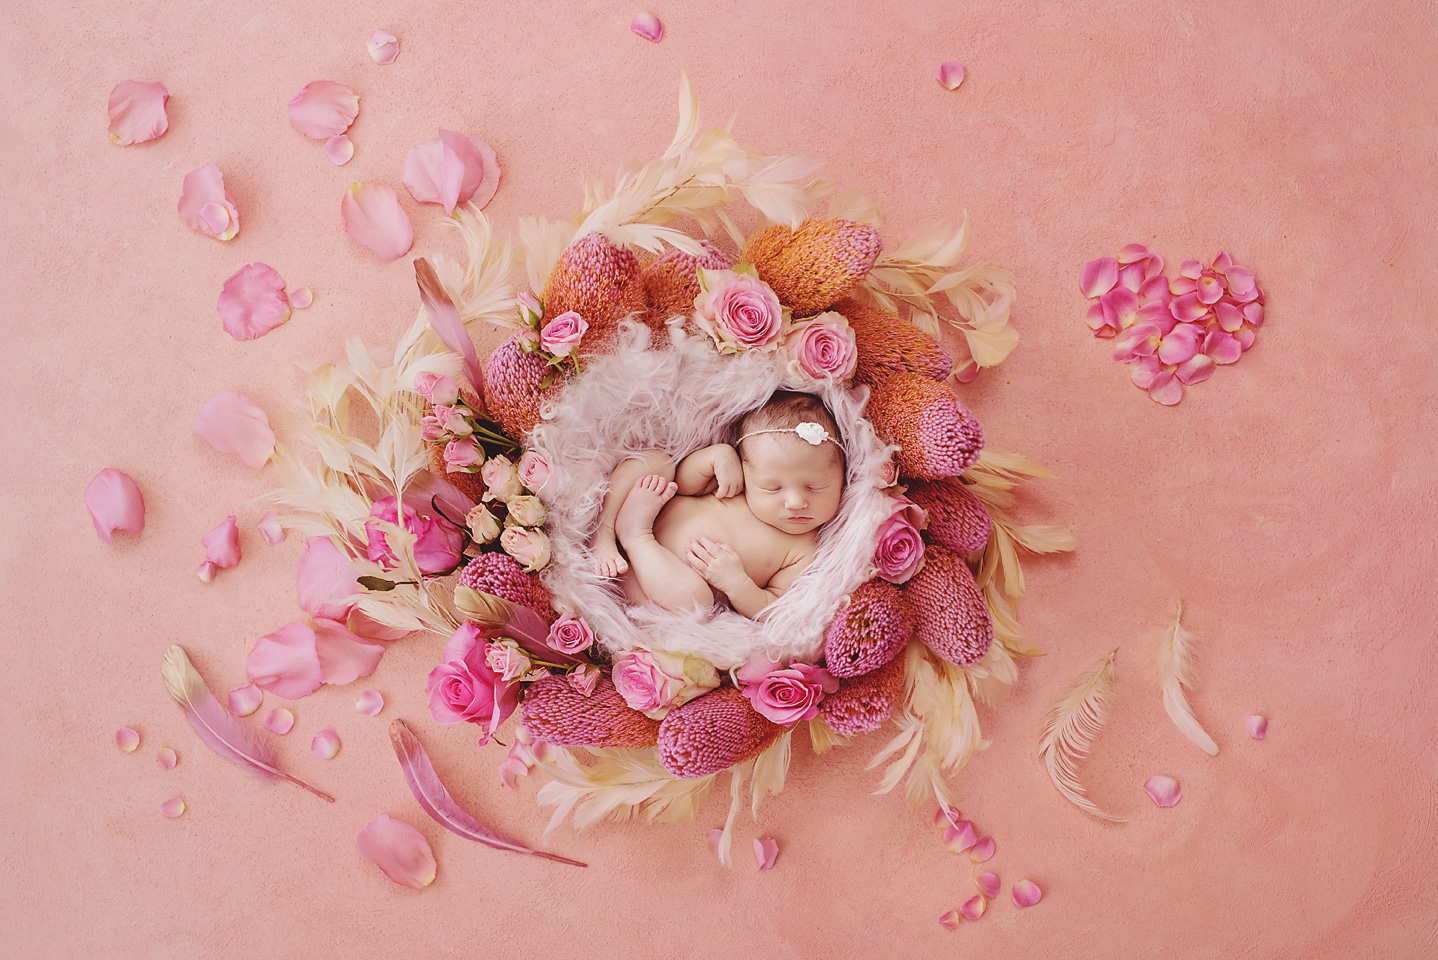 rightone-composite-bianca-morello-portraits-photography-montreal-newborn-copy.jpg